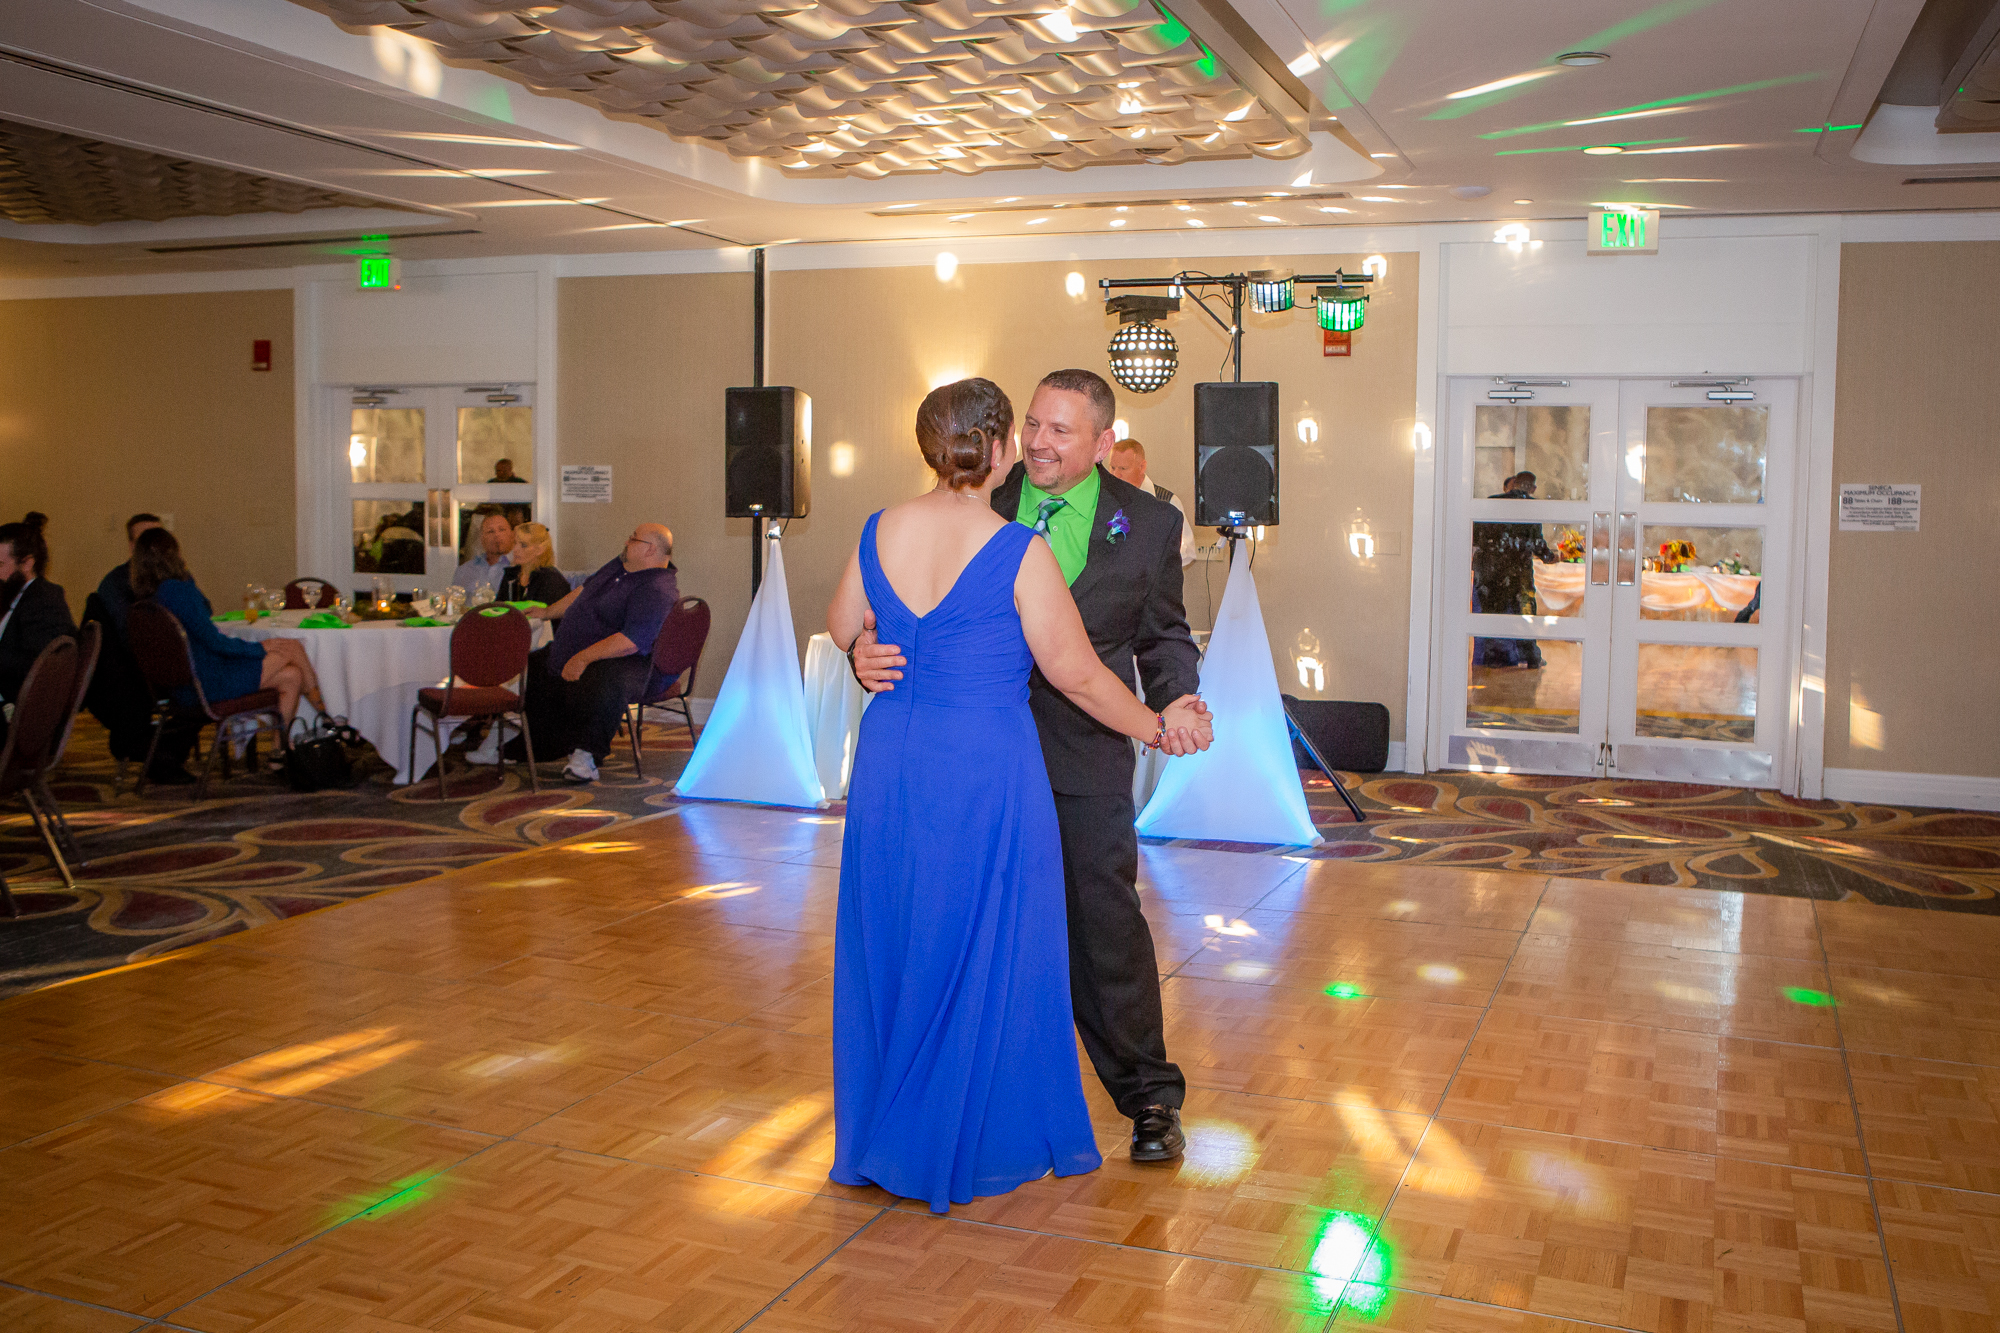 Raddison-Hotel-Corning-NY-Wedding-4462.jpg